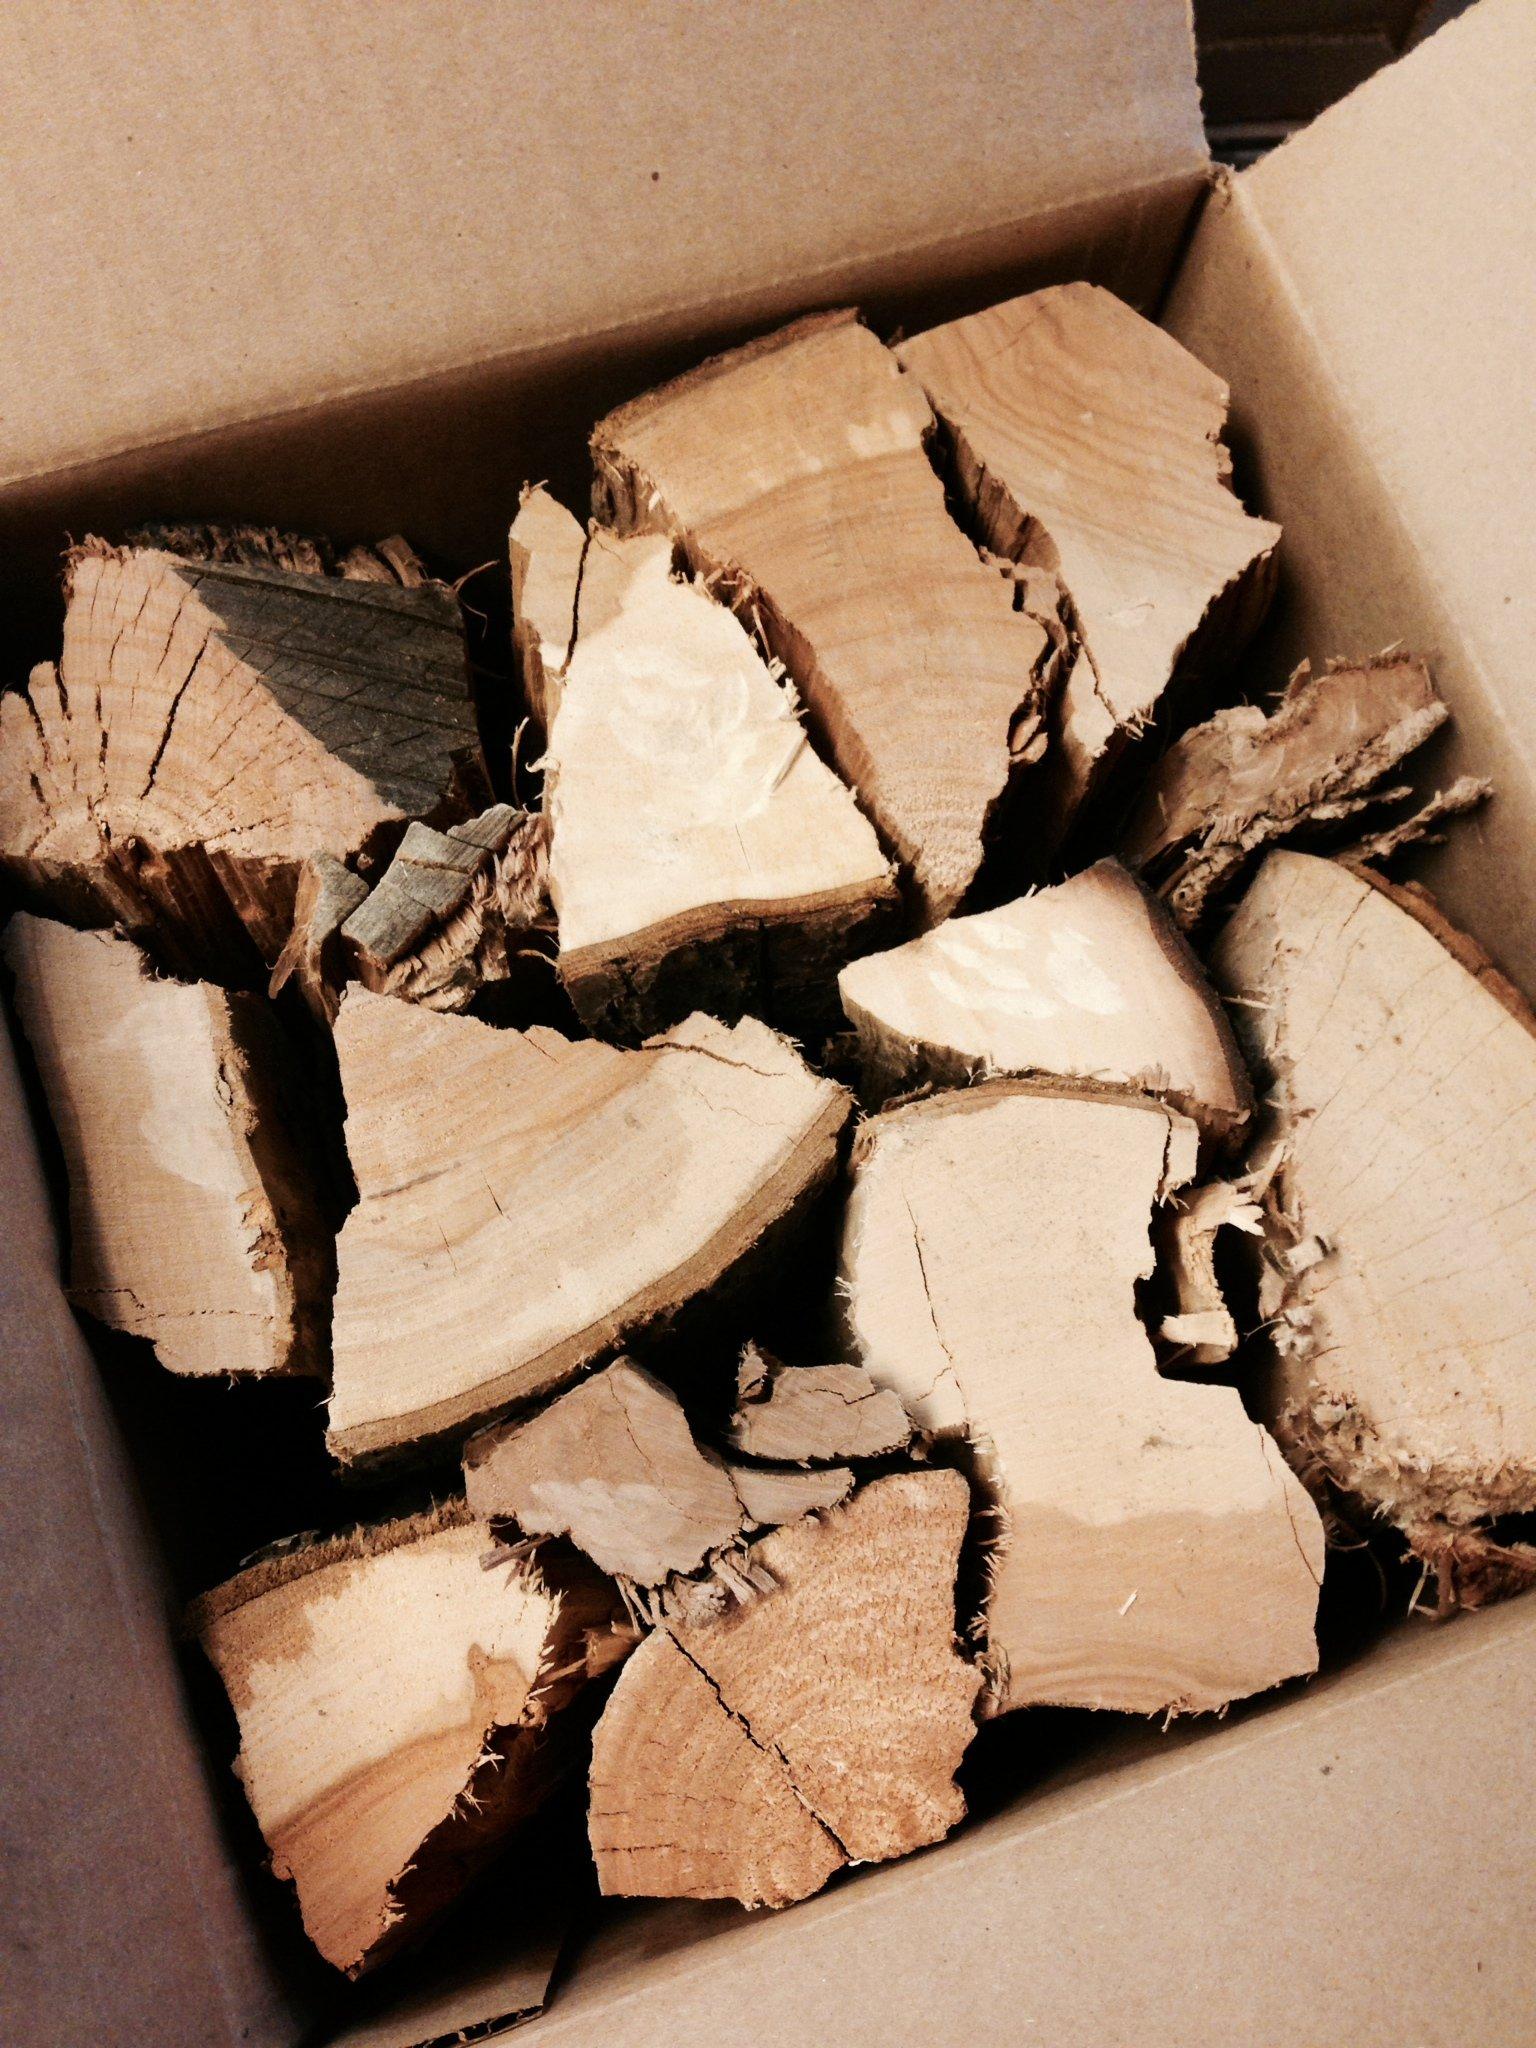 J.C.'s Smoking Wood Sticks - 730 Cu Inch Box - Hickory